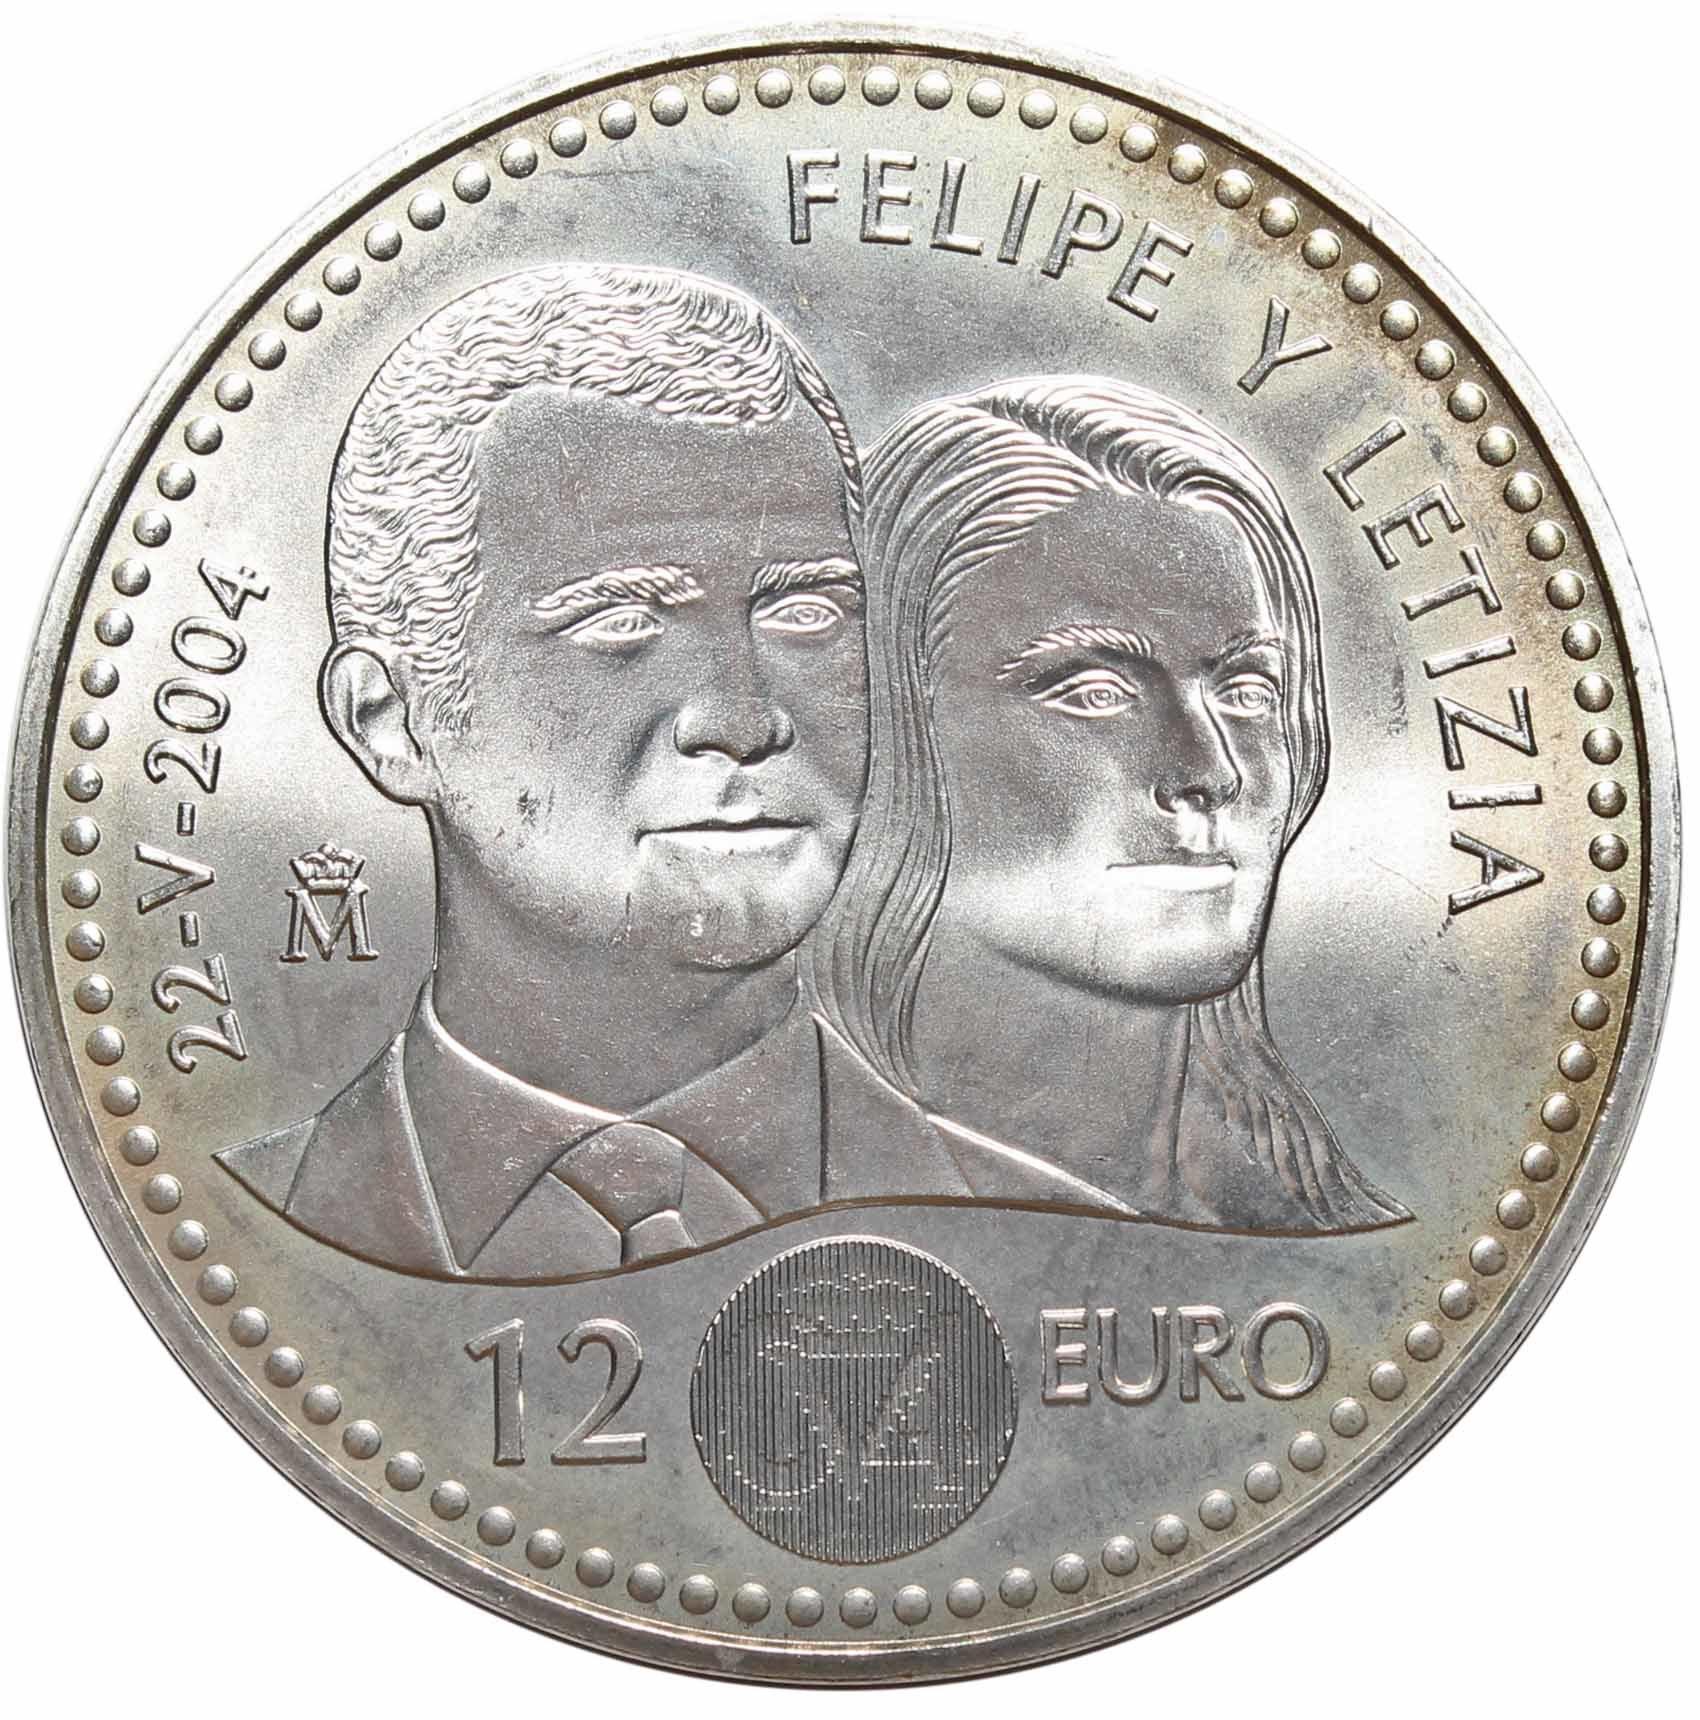 12 евро. Свадьба принца Фелипе и Летиции. Испания. 2004 г. Серебро AU